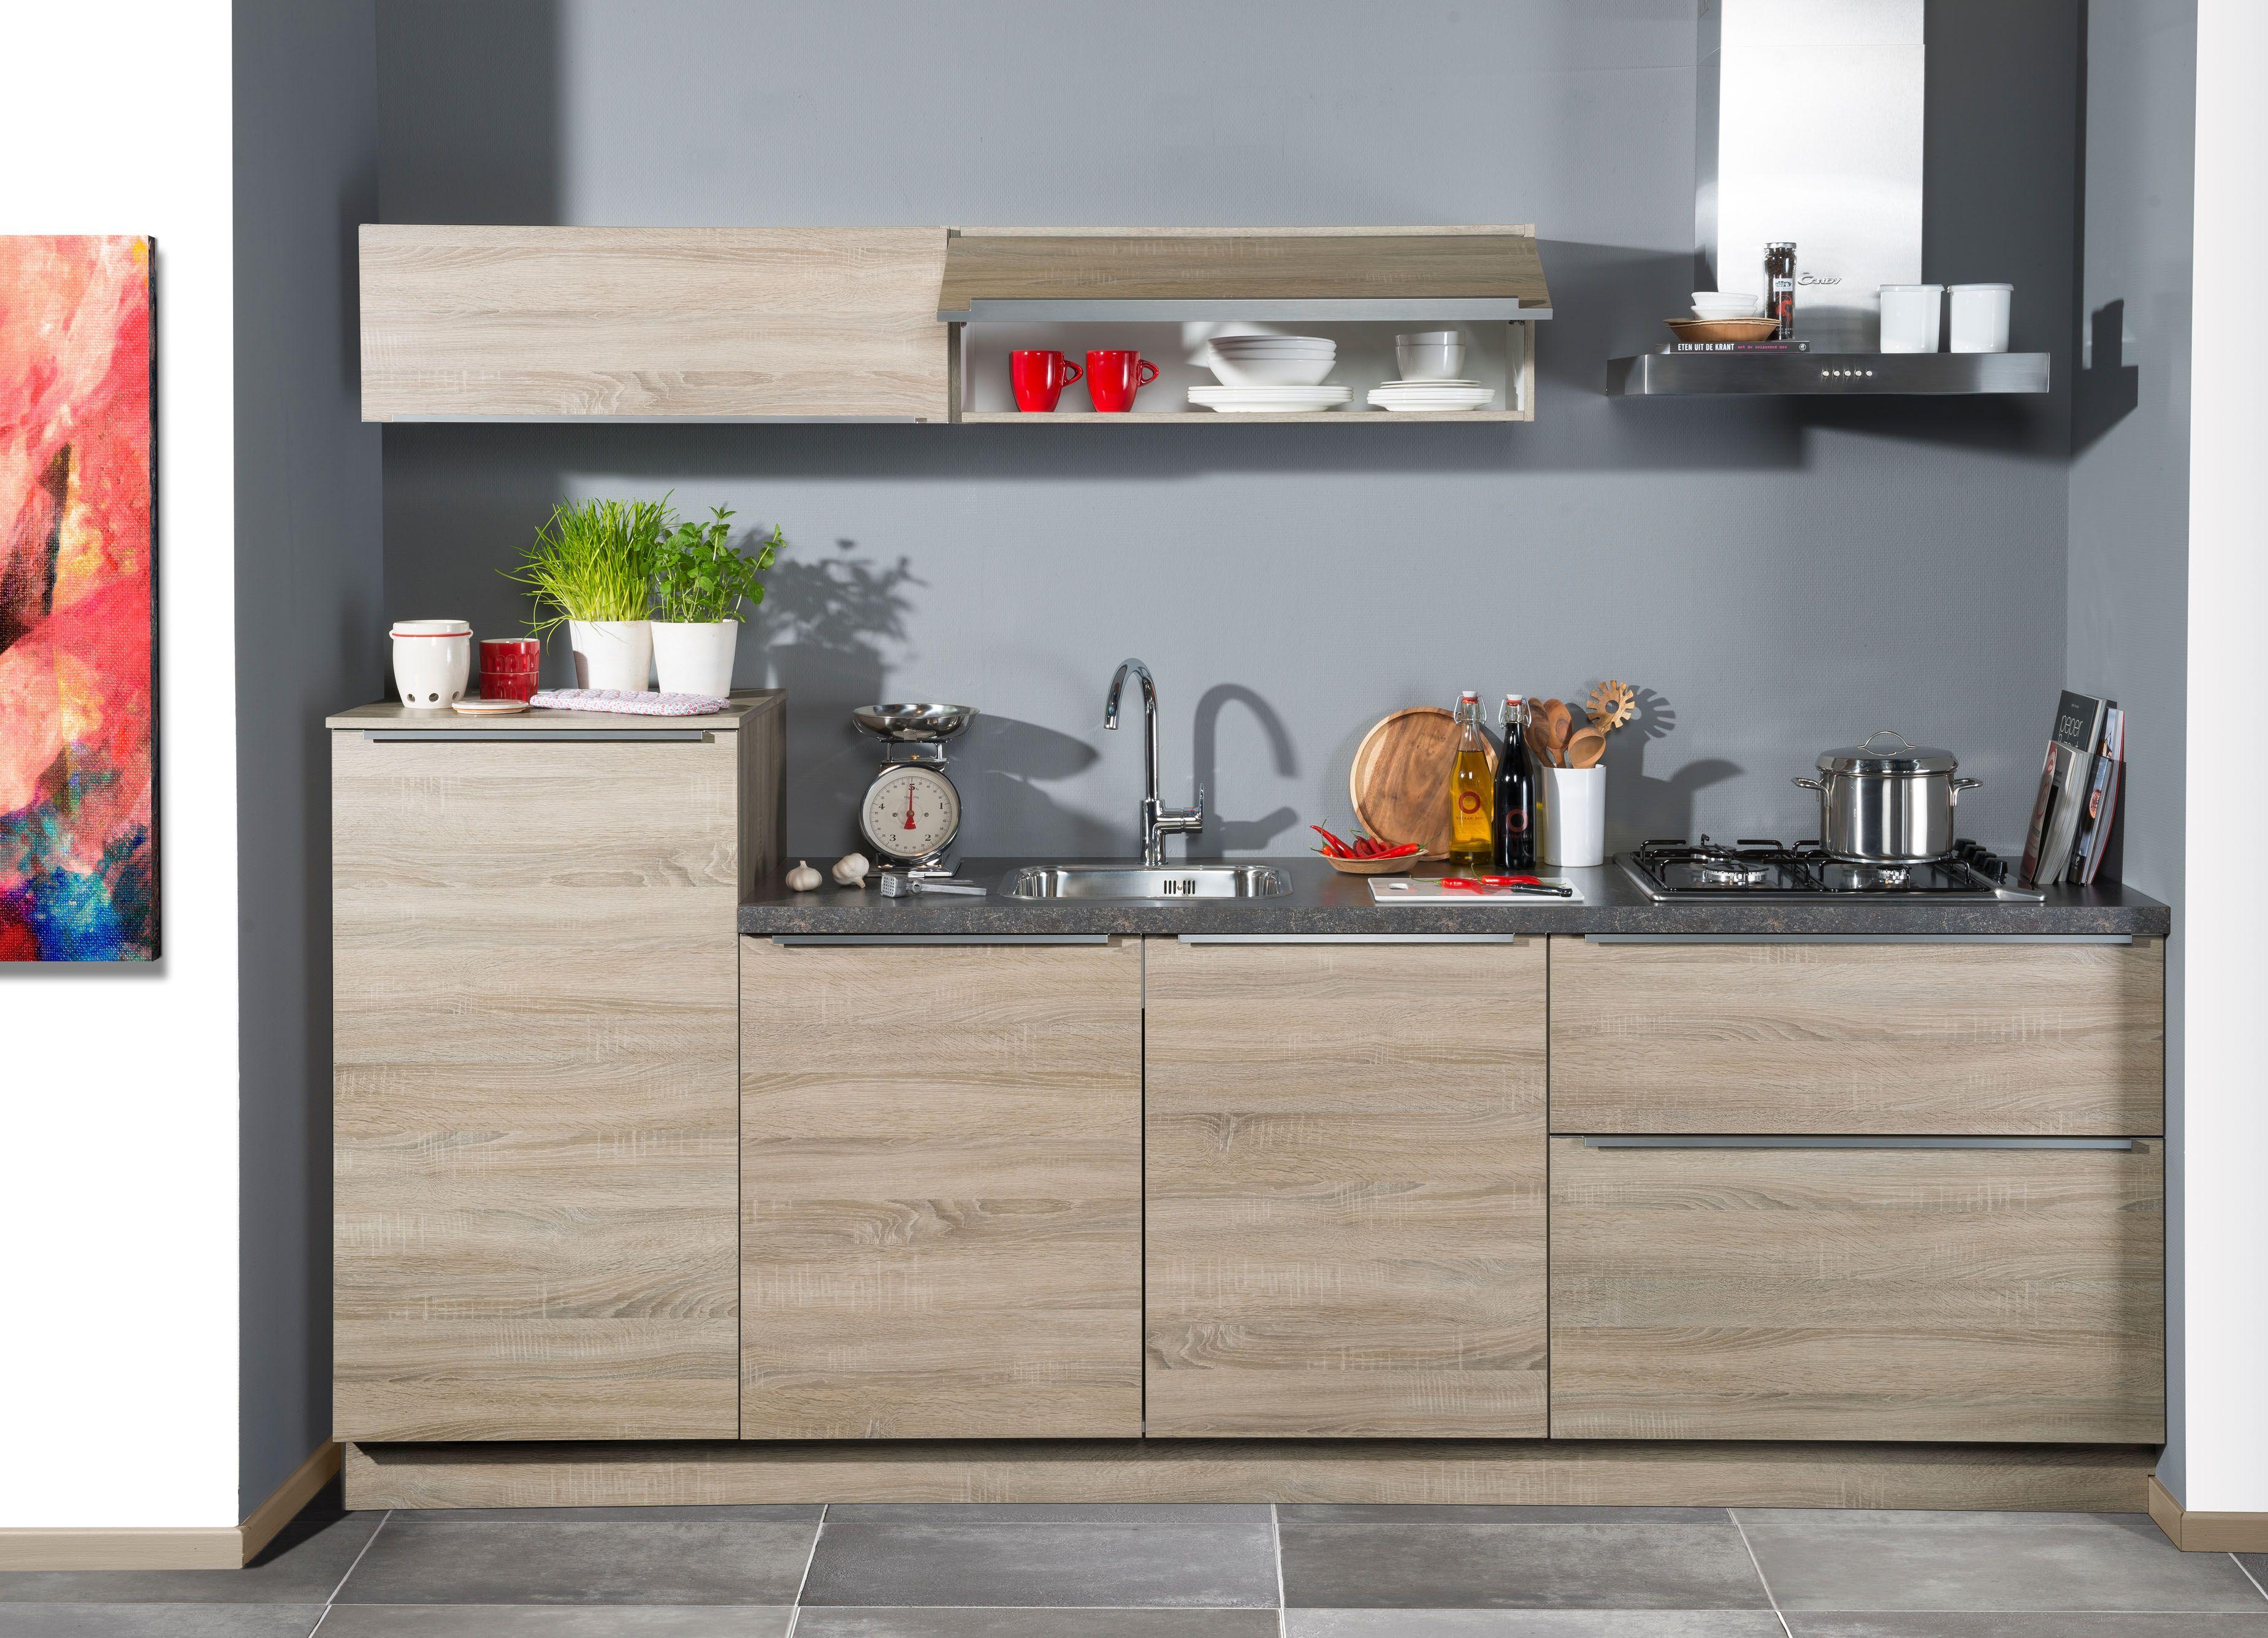 Moderne Keuken Keukenconcurrent : Joop bekijk deze keuken online bij keukenconcurrent ideeën